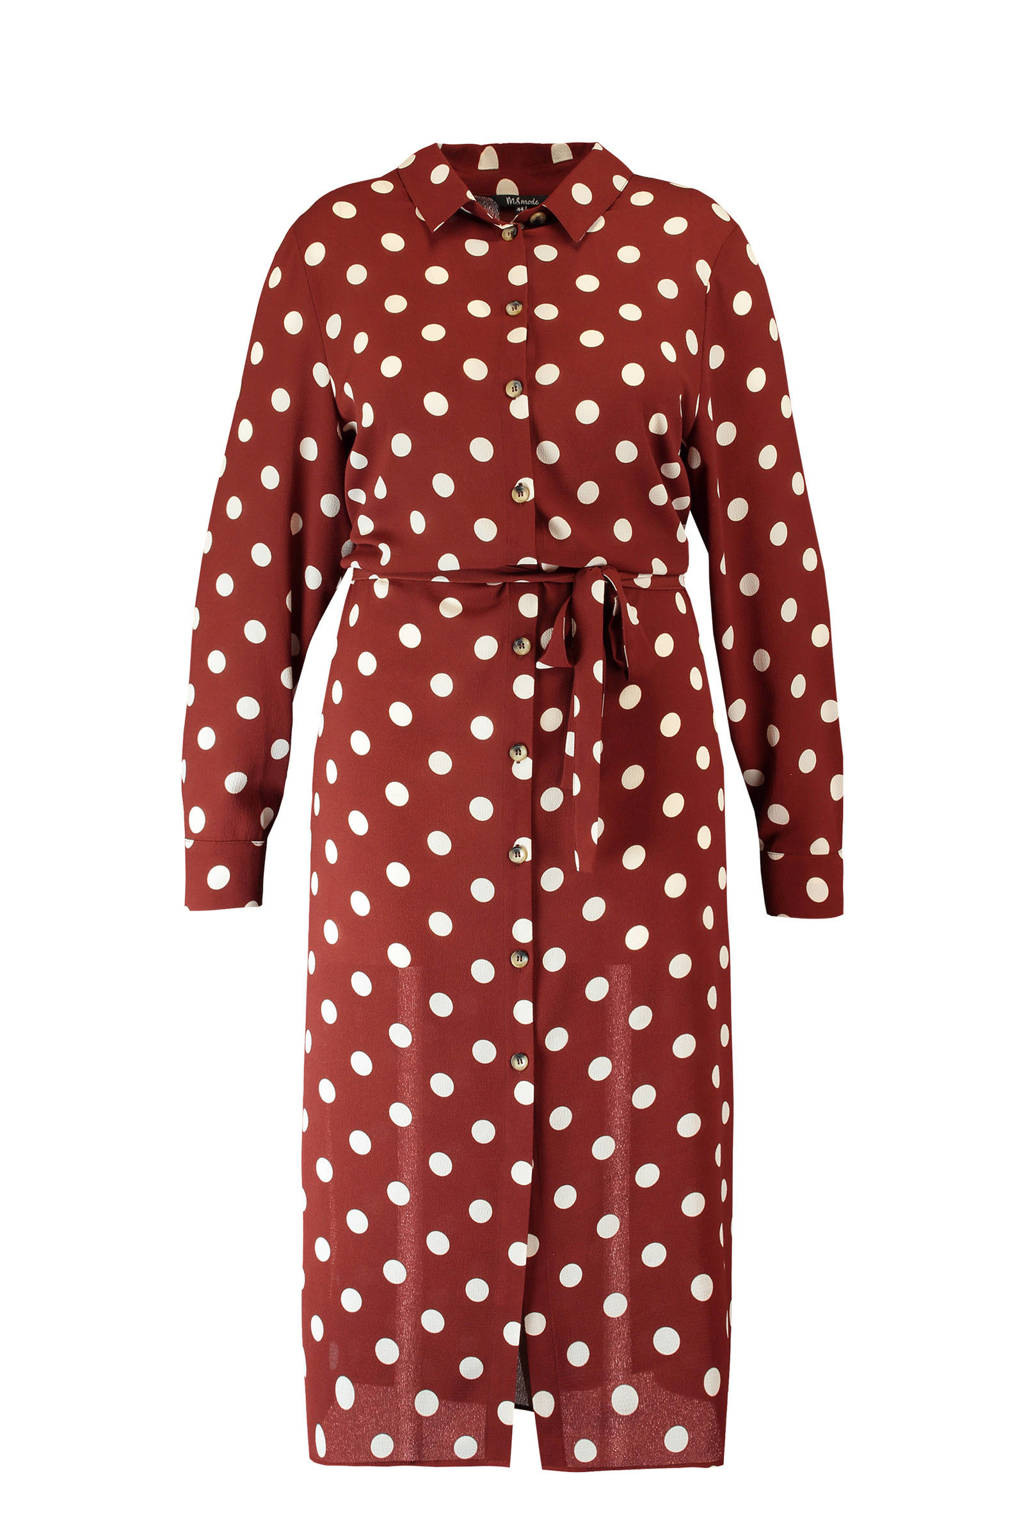 MS Mode jurk met stippenprint donkerbruin, Multi